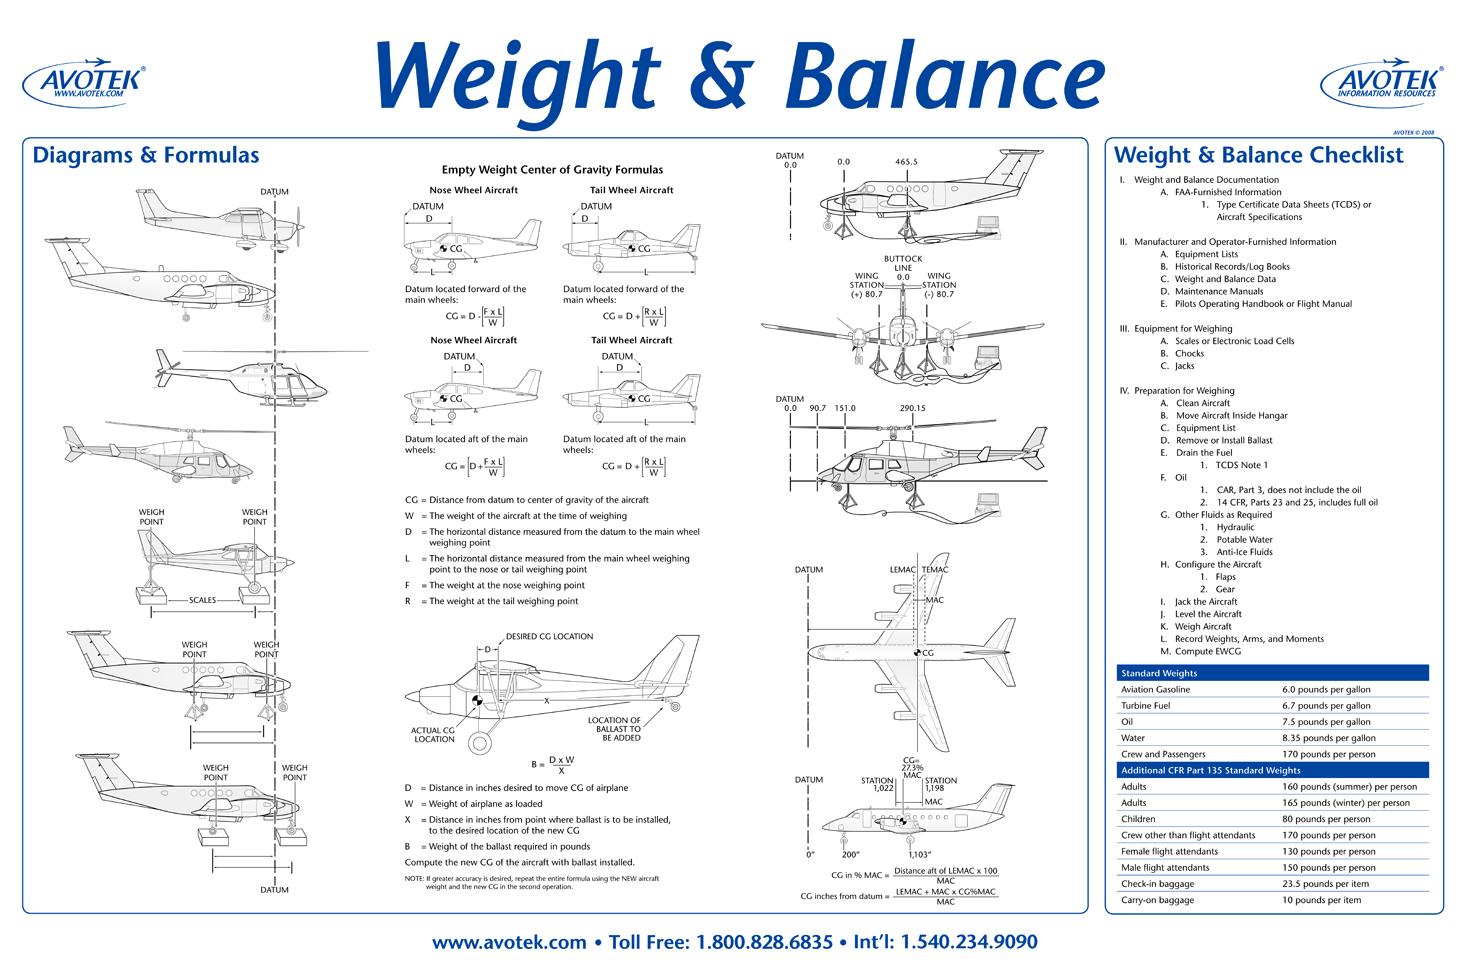 Classroom Poster - Weight & Balance